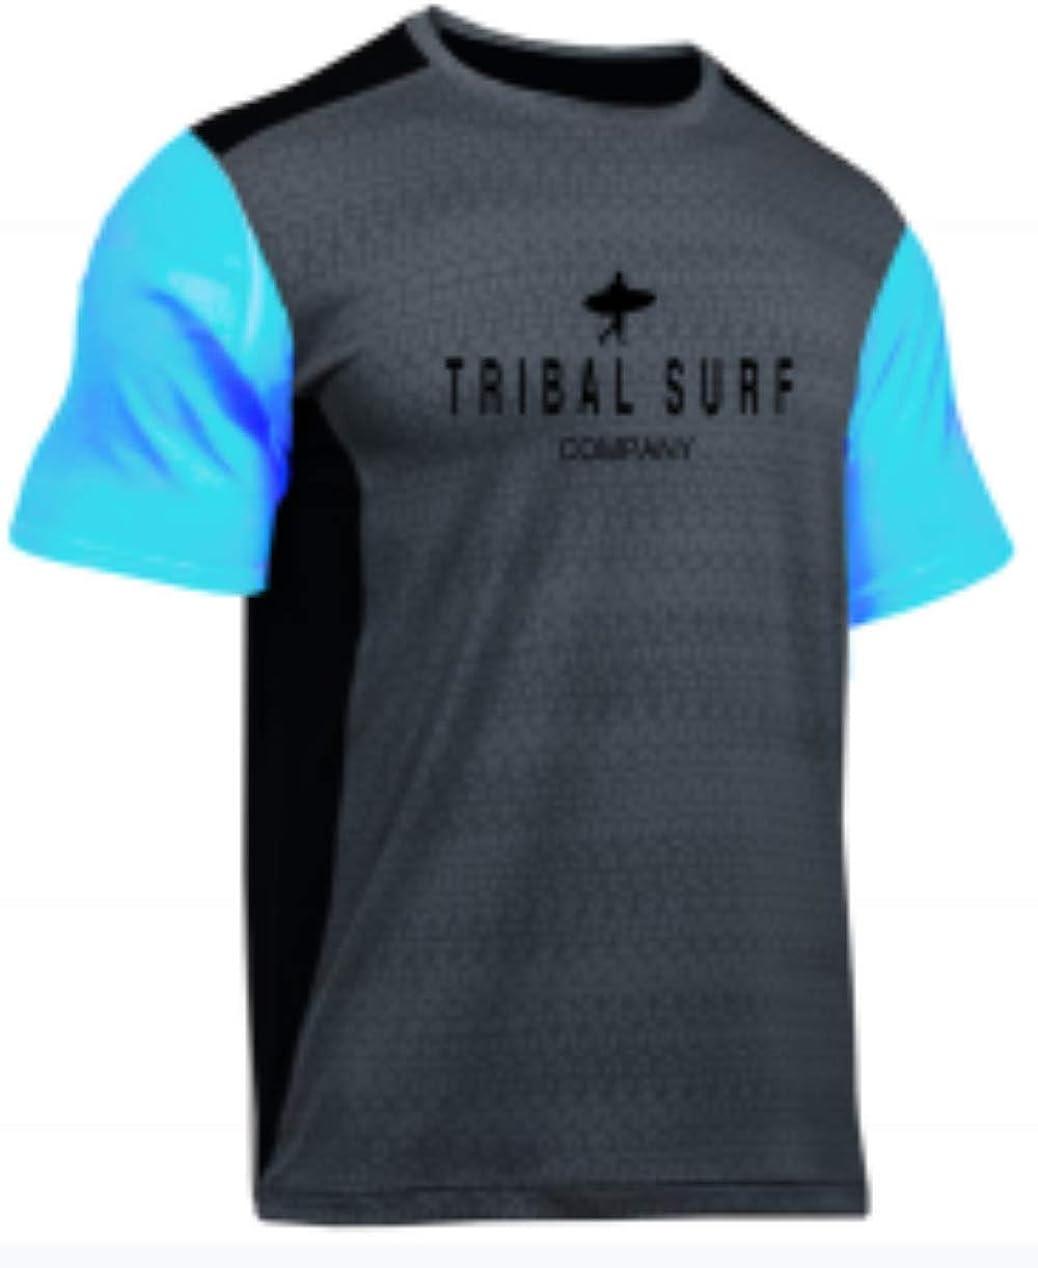 Tribal Surf Men's Rashguards Loose Fit (Choose Color & Size)